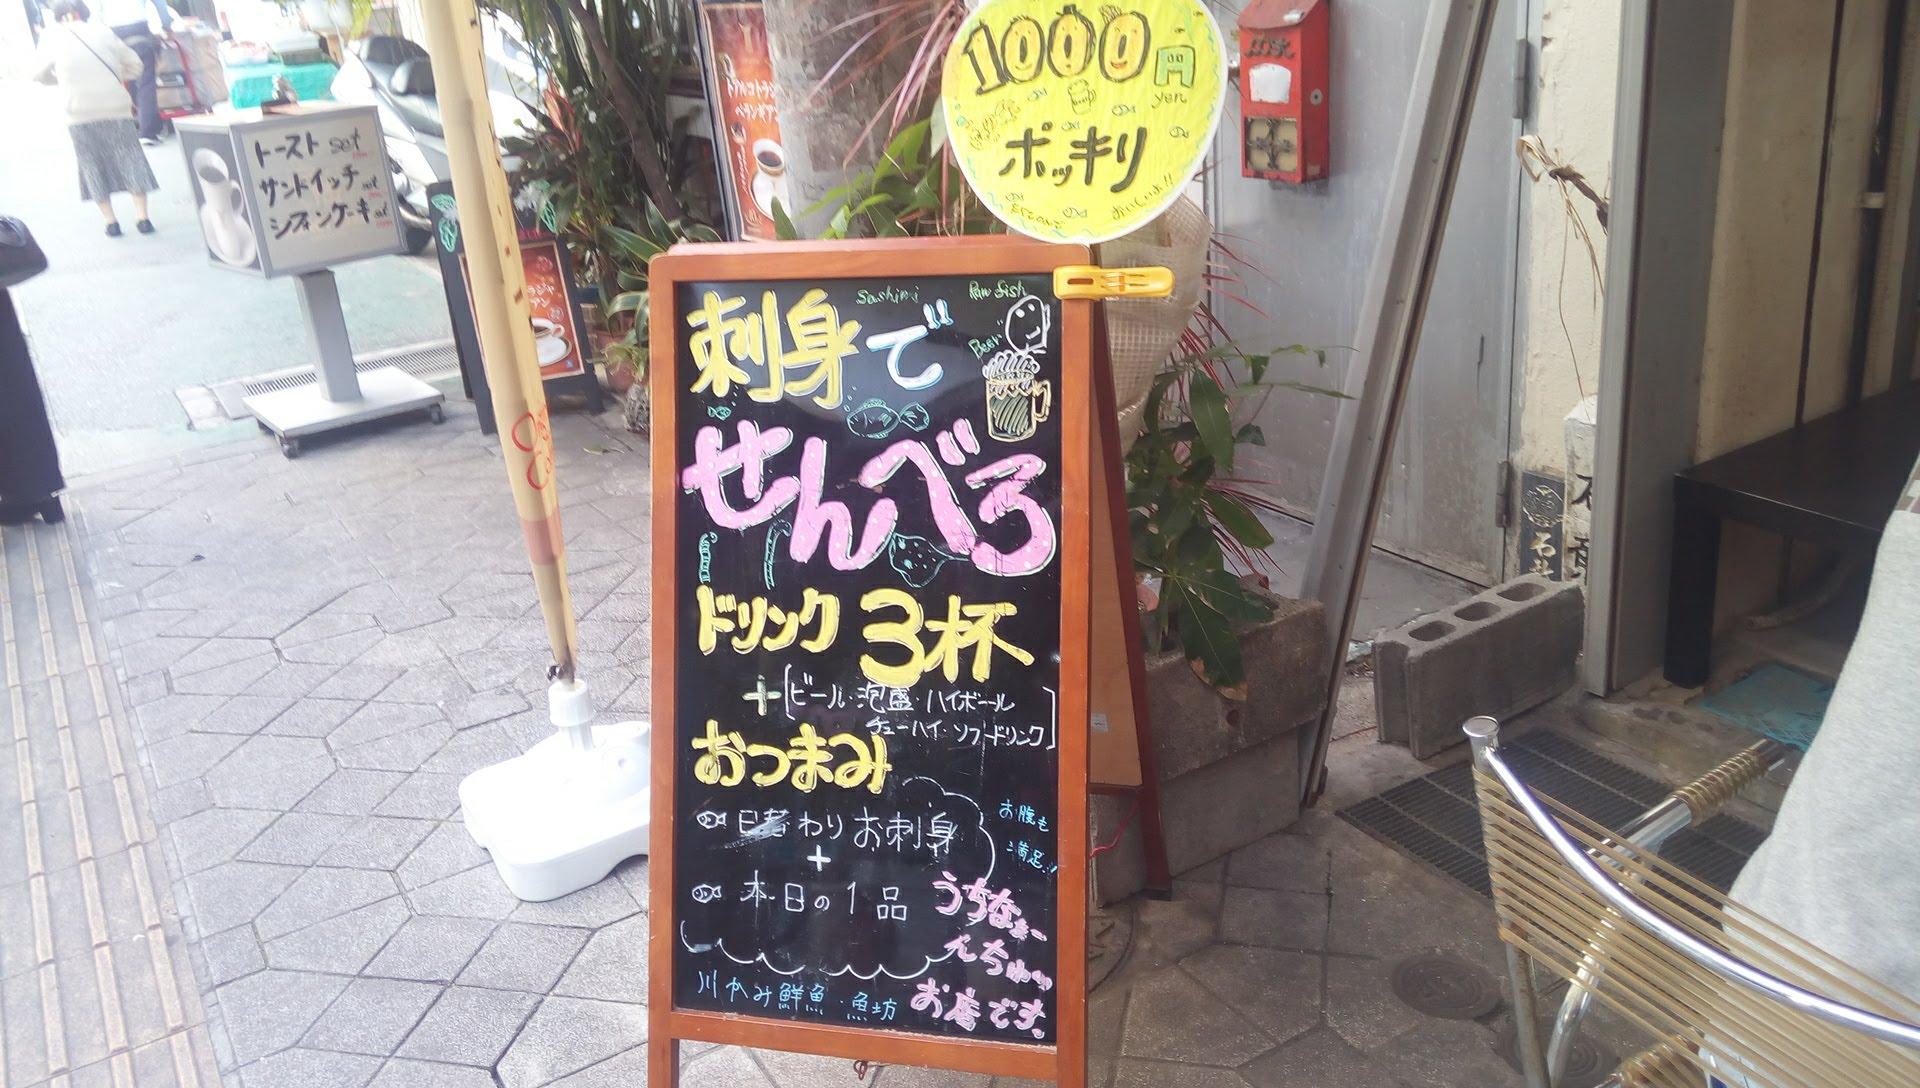 Uobou signboard as a landmark